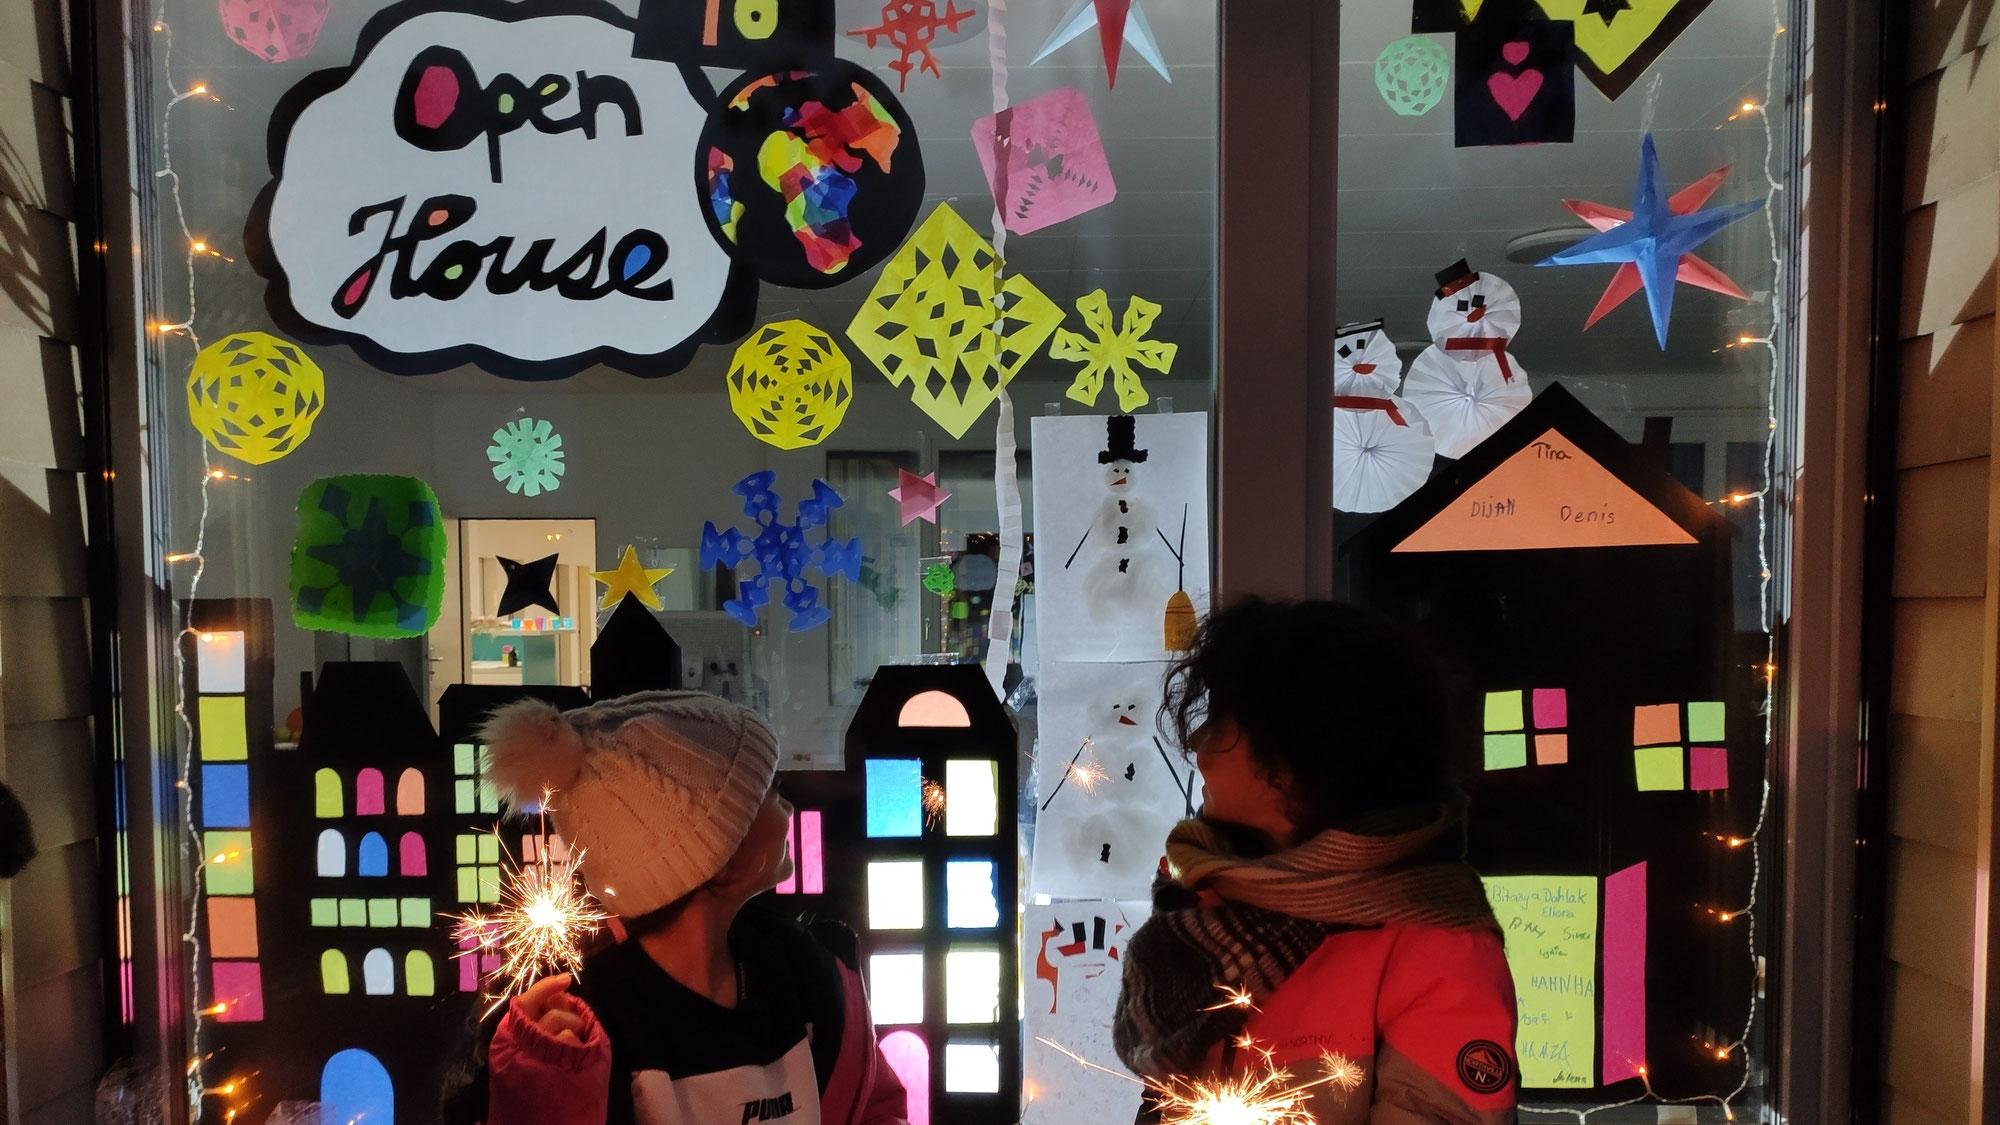 Rückblick und Ausblick Kindertreff Open House